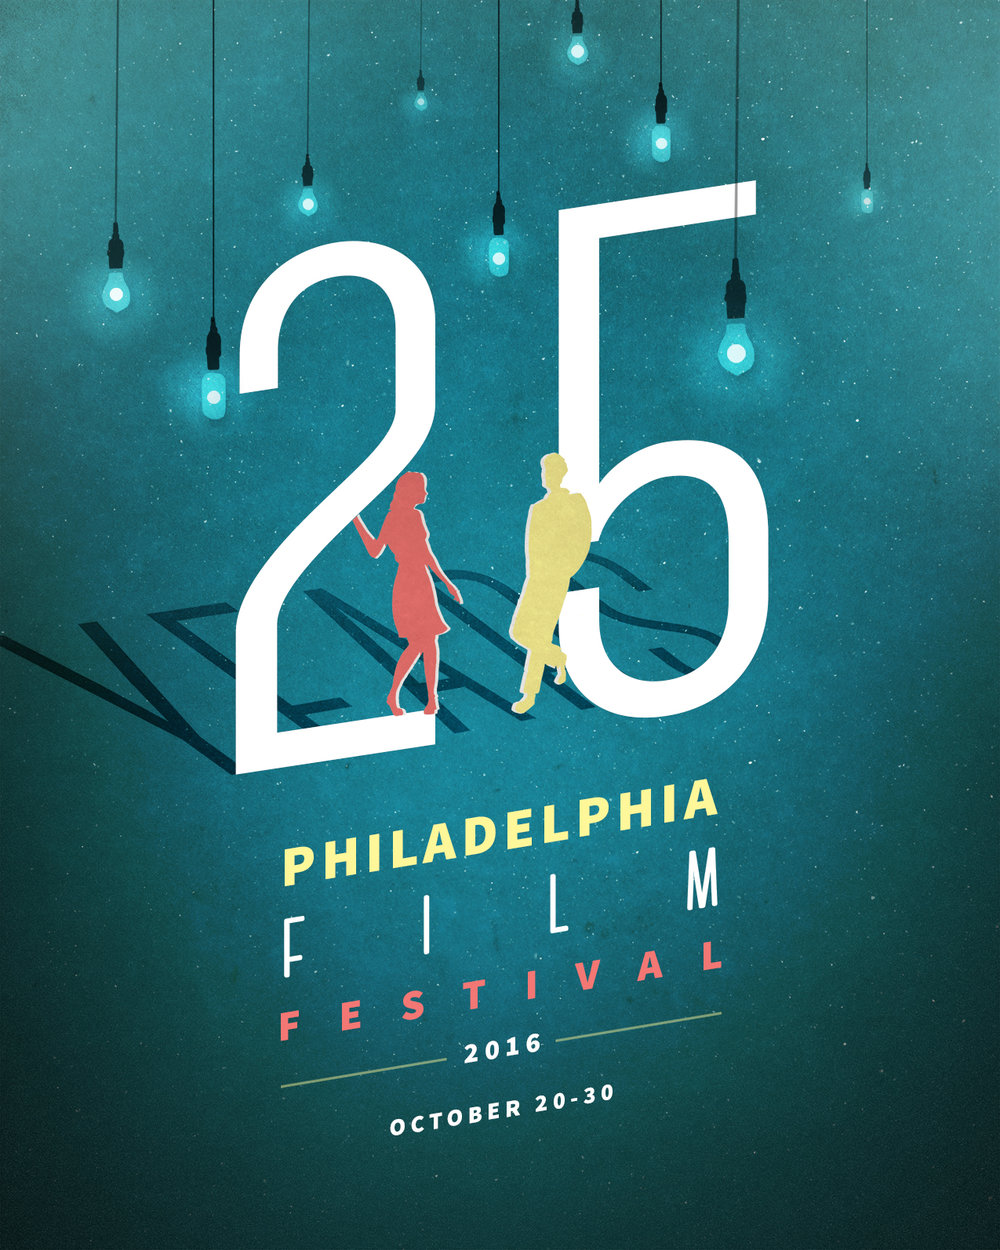 Philadelphia Film Festival 2016: 25th Anniversary